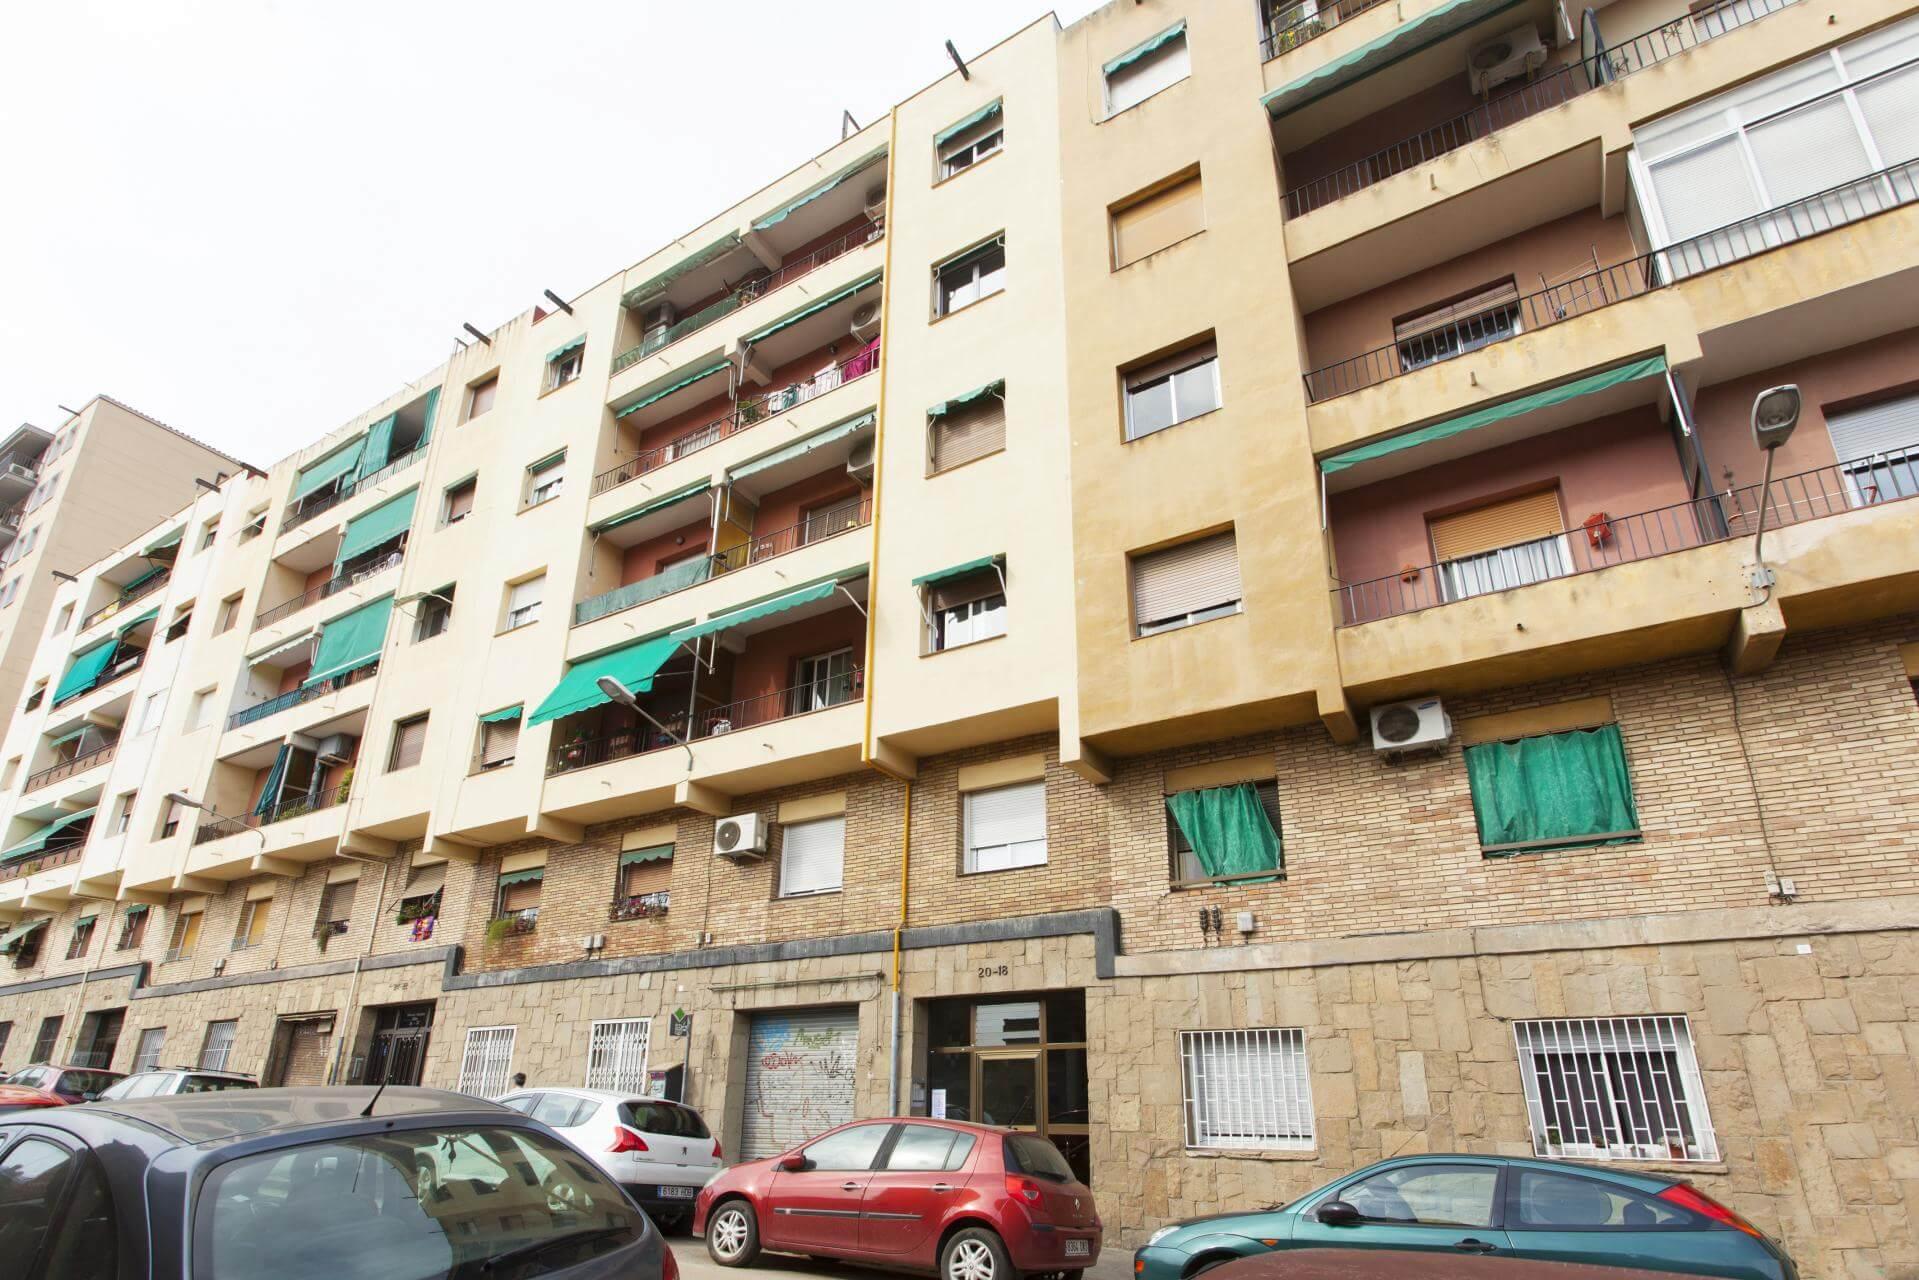 Shbarcelona appartement louer sants montju c barcelone for Location appartement design barcelone